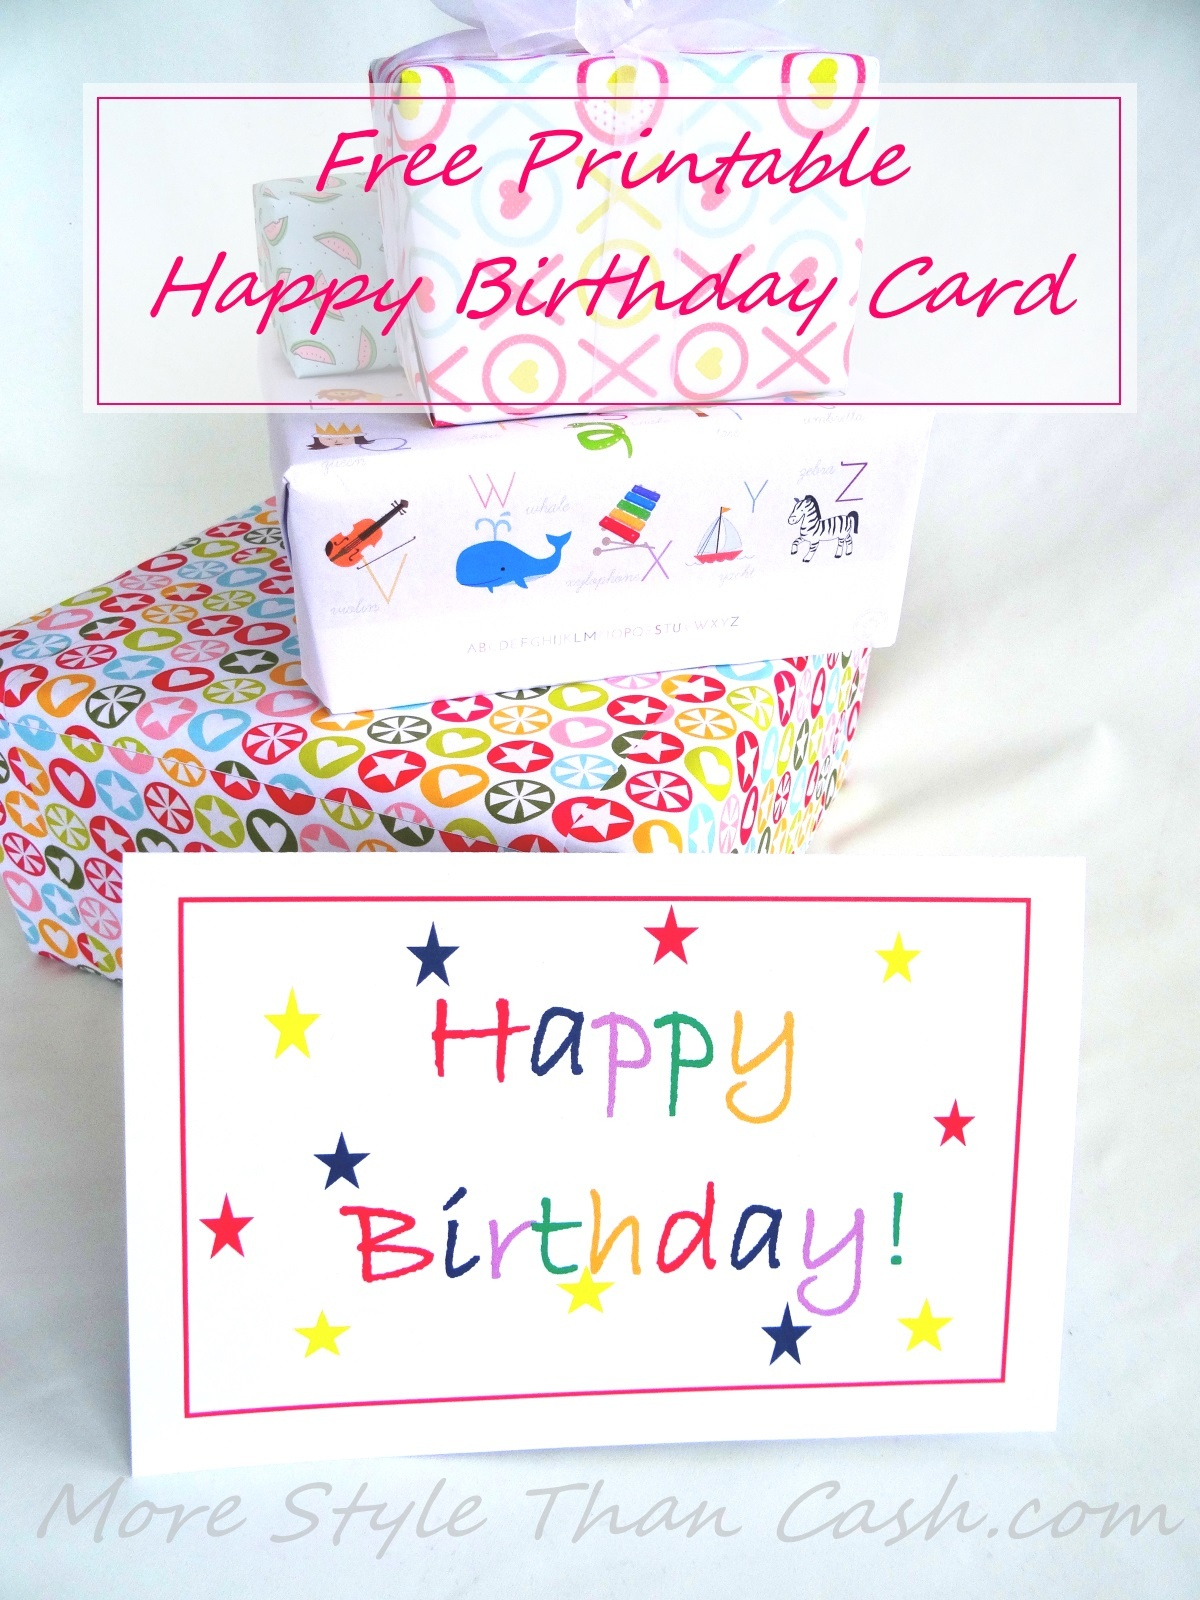 Free Printable Birthday Card - Happy Birthday Free Printable